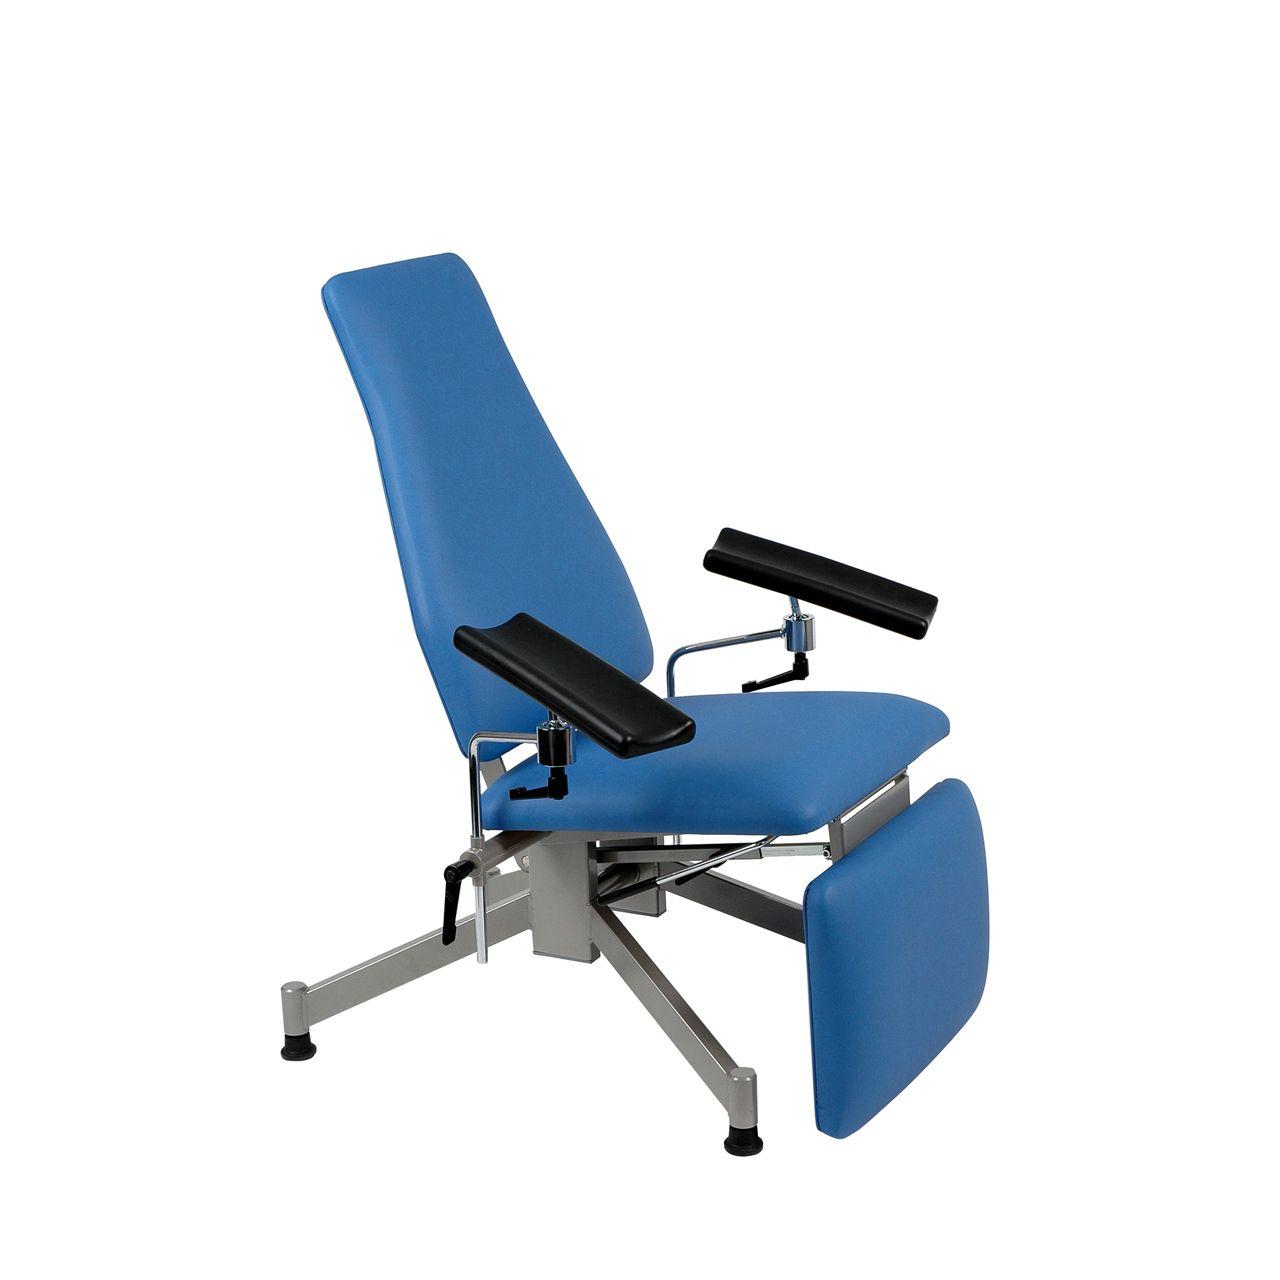 Prikstoel vario werkstoelen ARTNRNNB 0000s 0005 2 armleggers